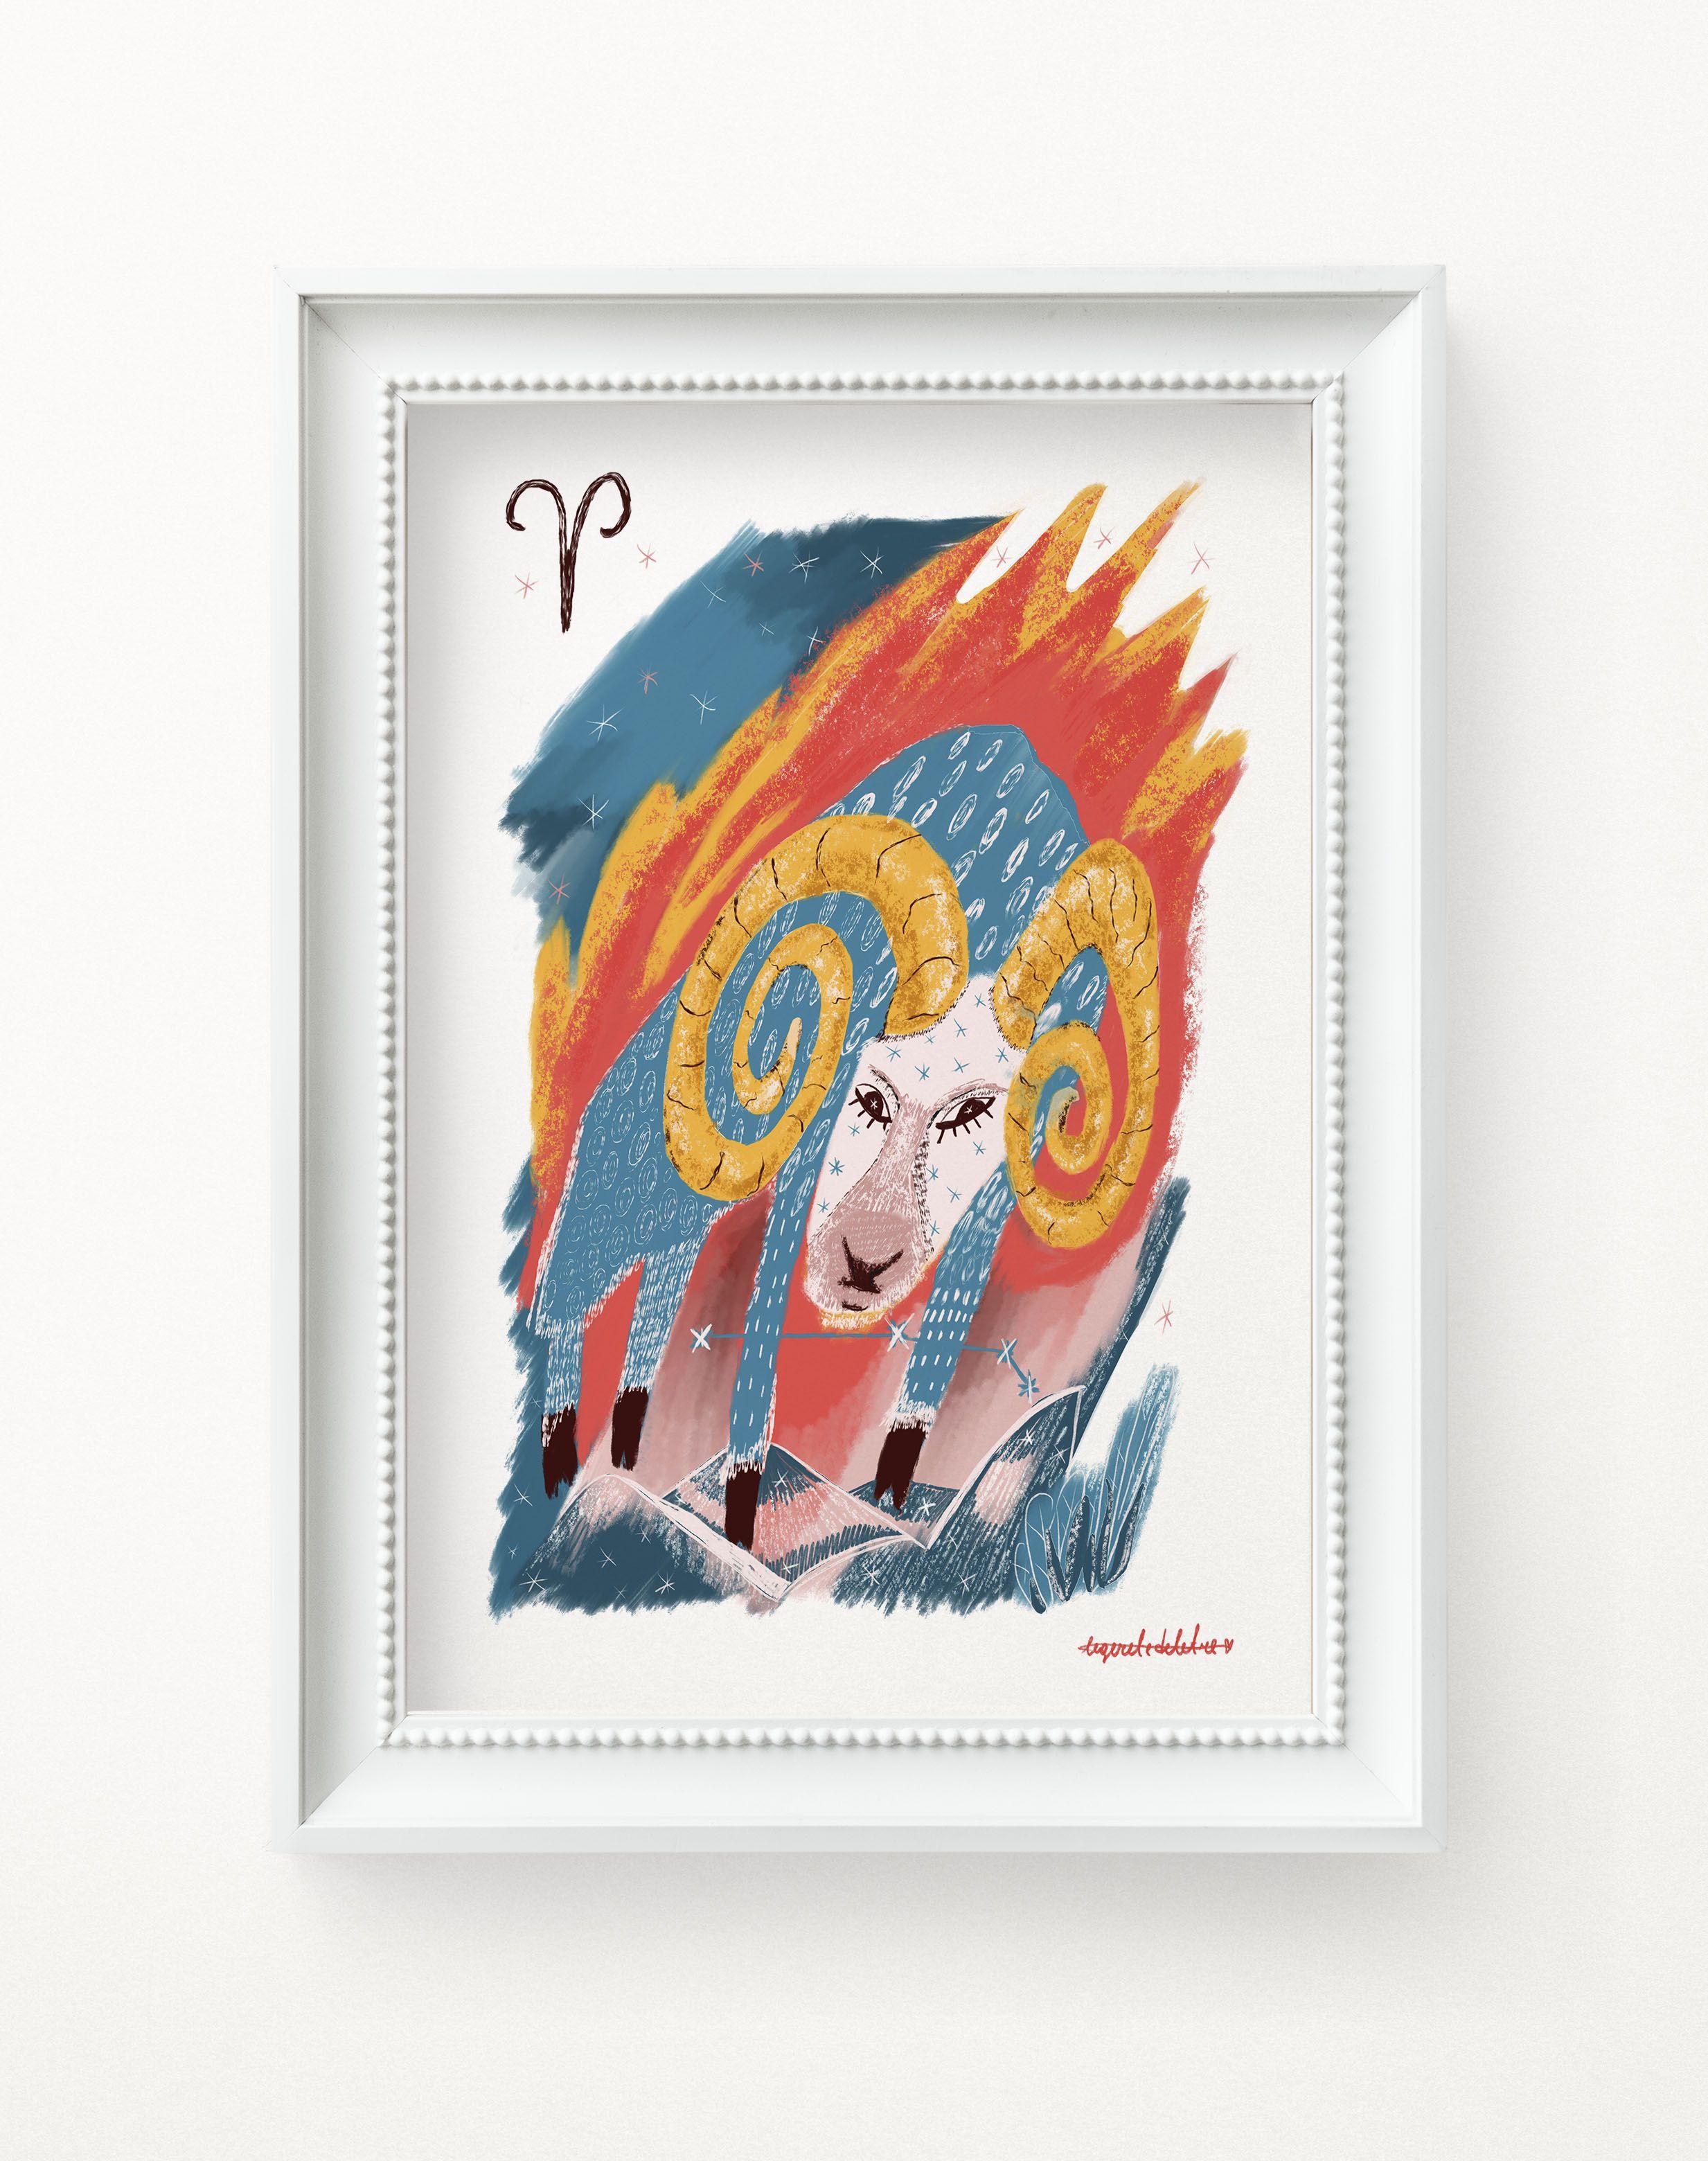 Aries Zodiac Sign Art Print Aries Birthday Gift Aries Etsy In 2020 Sign Art Art Prints Posters Art Prints